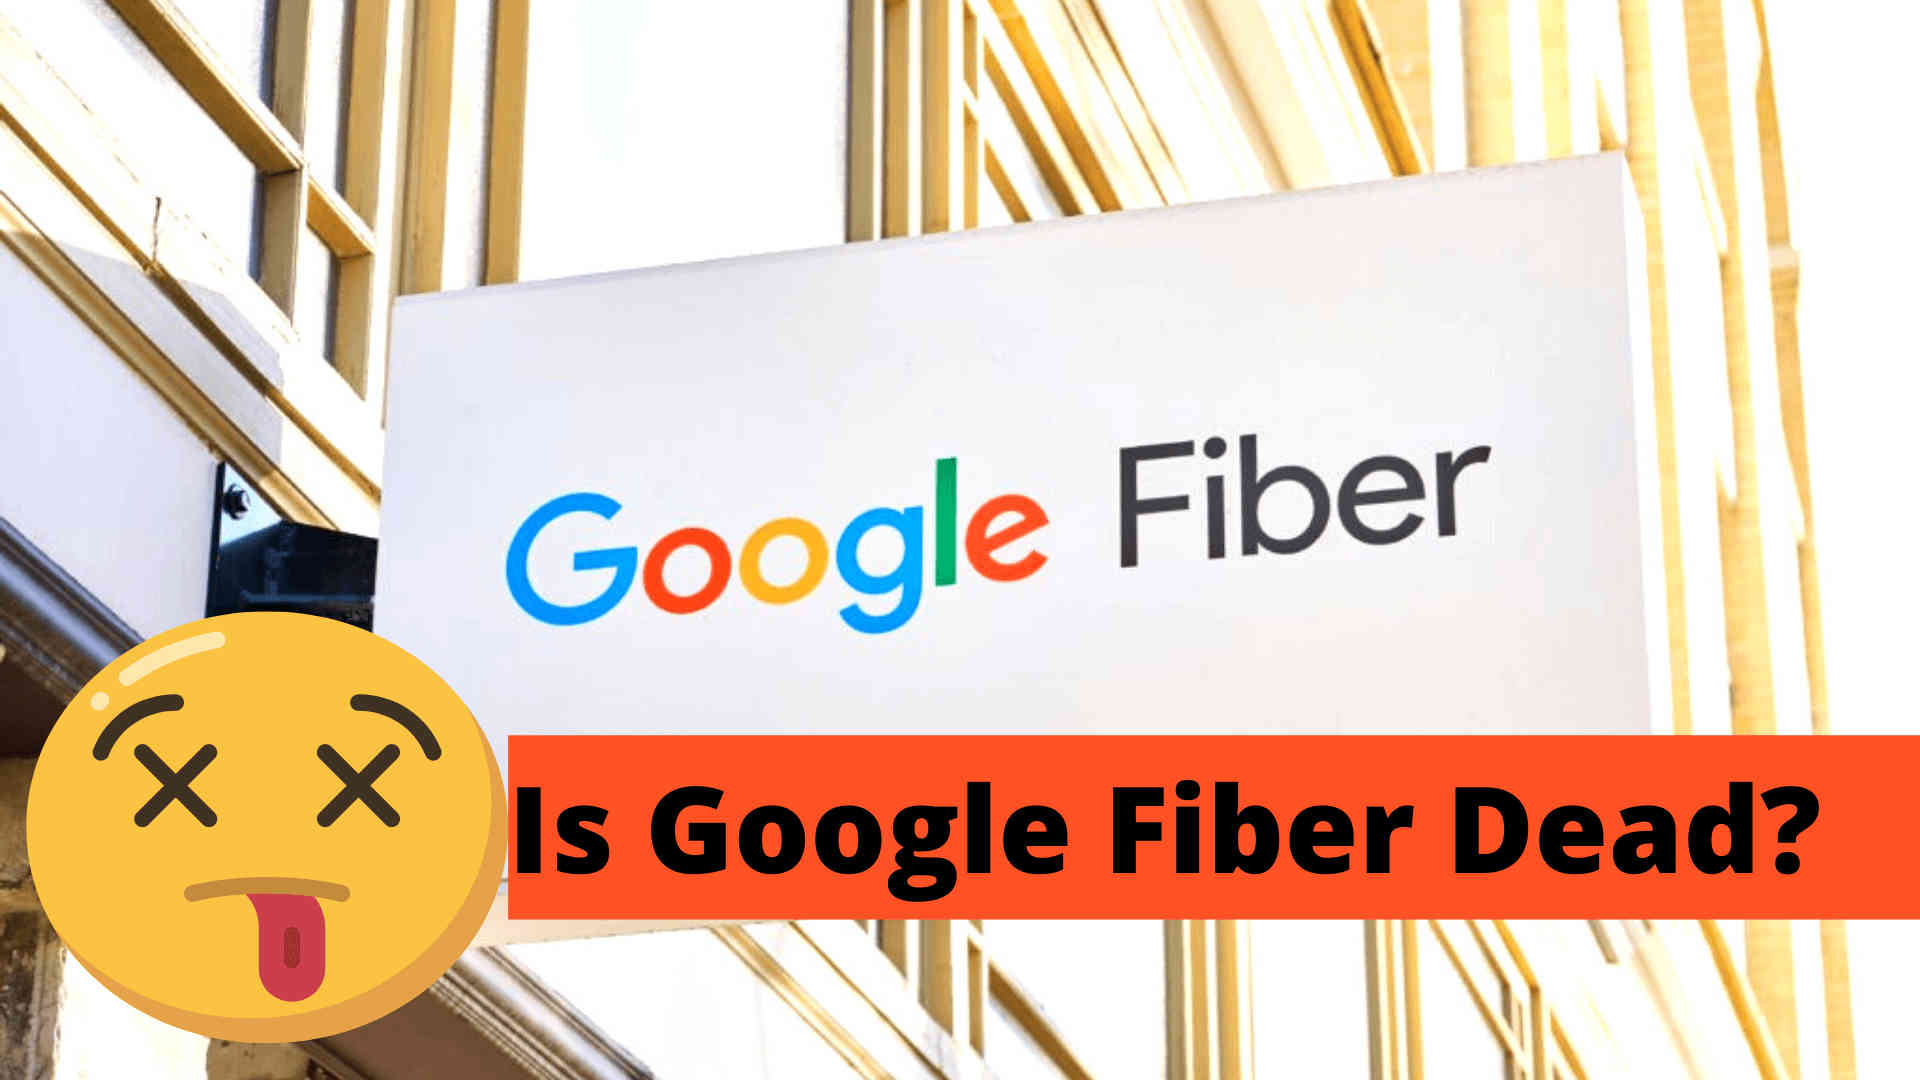 Is Google Fiber Dead